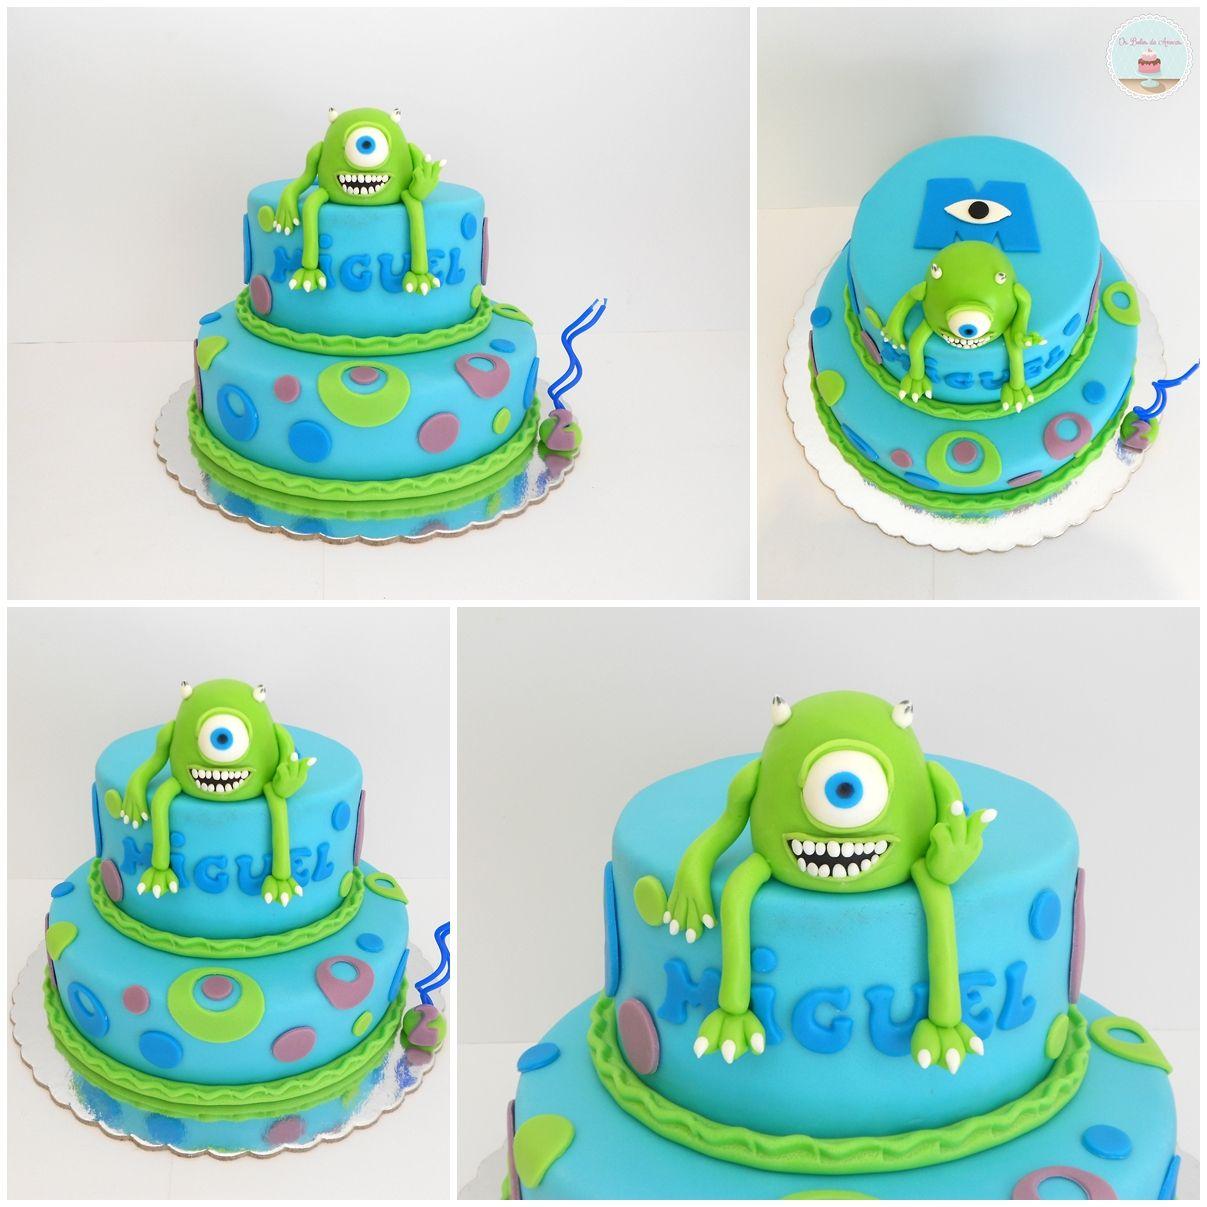 Phenomenal Disney Pixar Monsters Inc Mike Wazowski Cake With Images Funny Birthday Cards Online Hendilapandamsfinfo